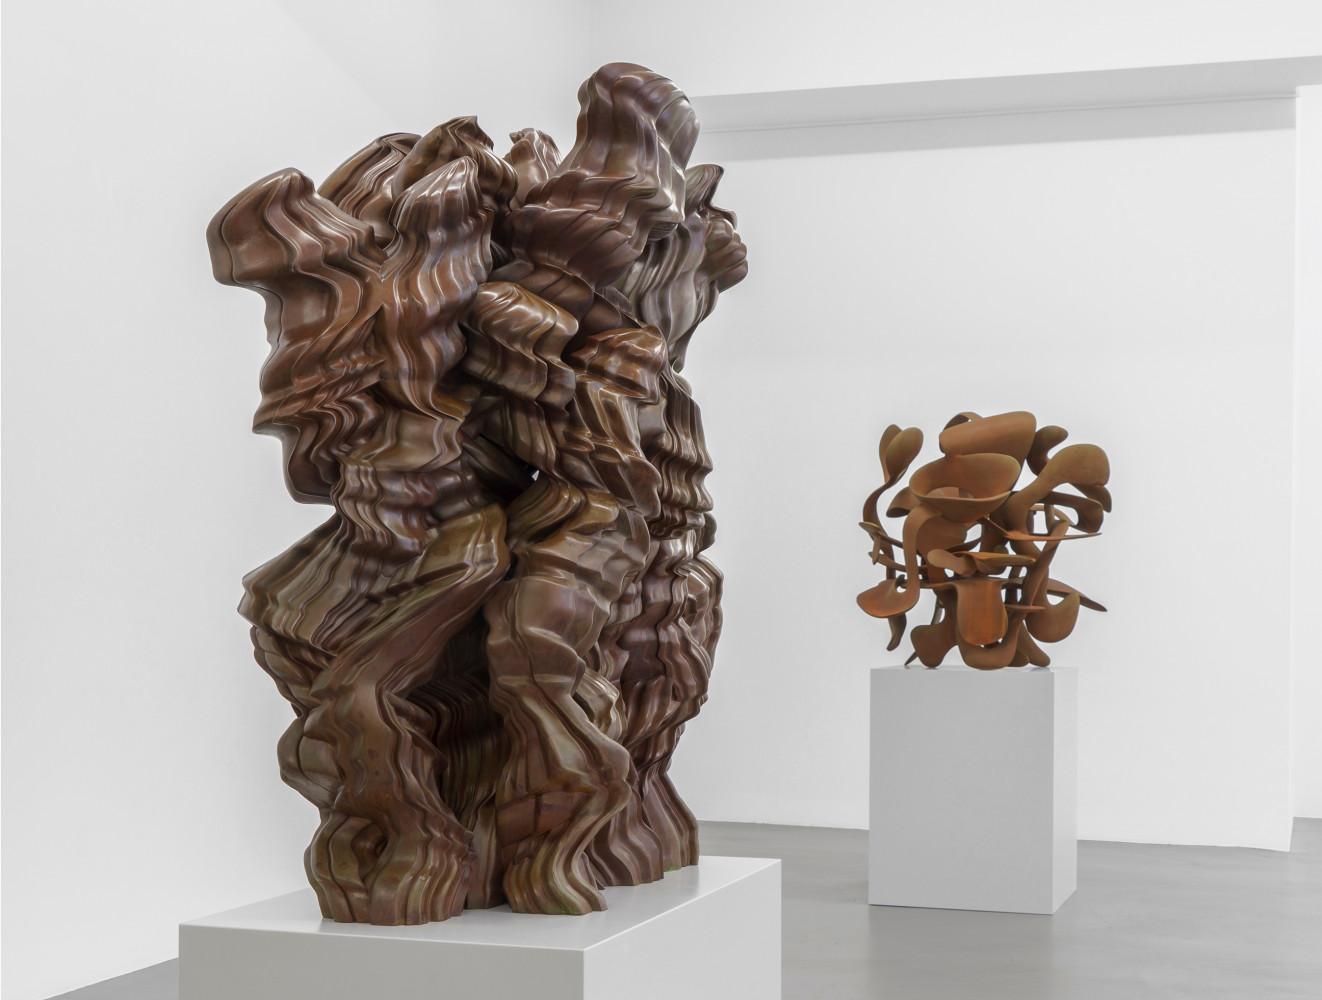 Tony Cragg, Installation view, Buchmann Galerie, 2018